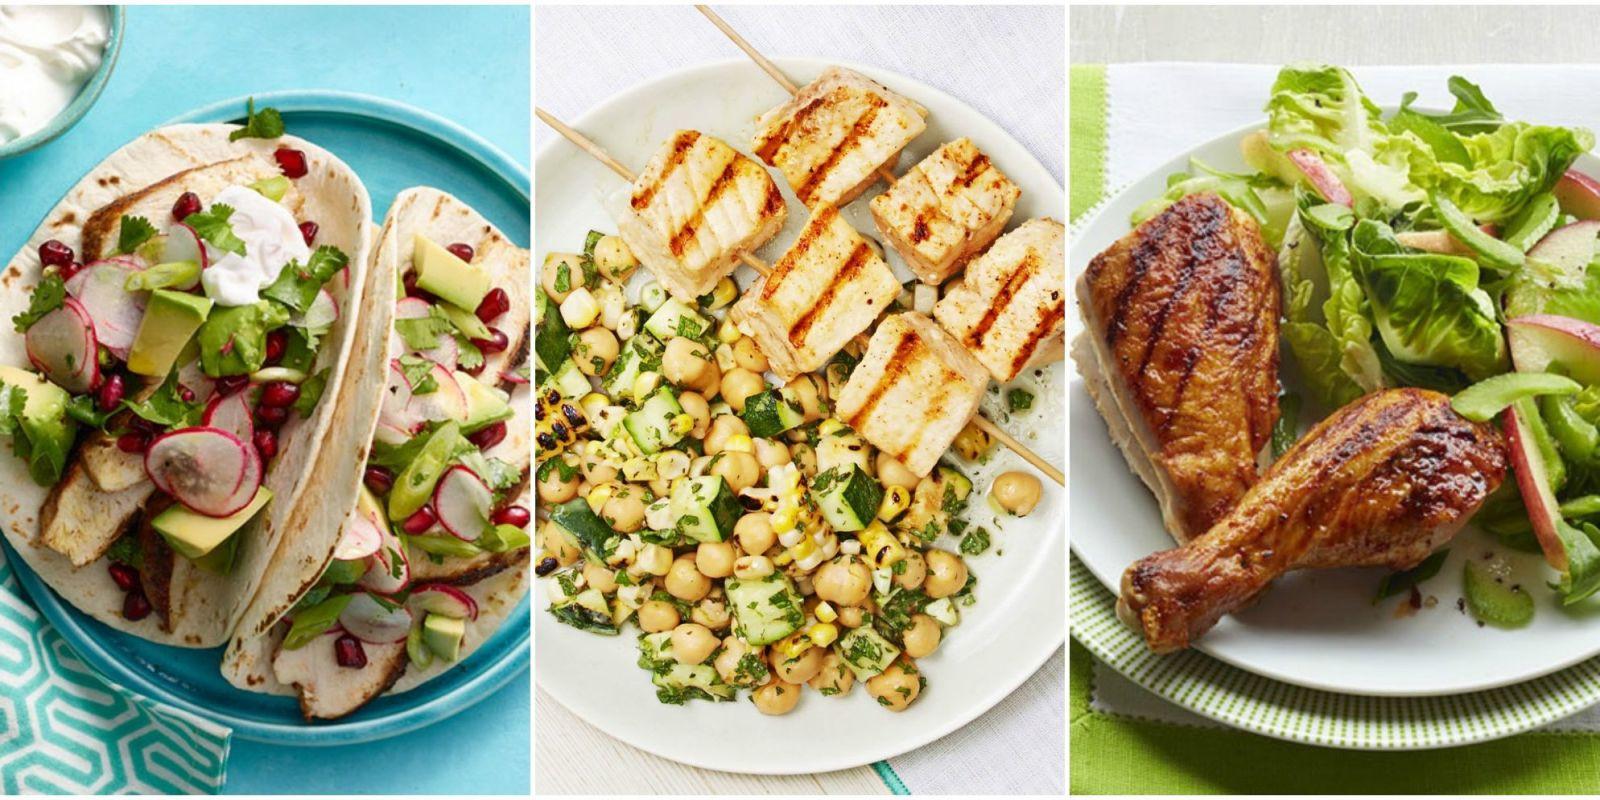 Easy Summer Dinner Recipes  60 Best Summer Dinner Recipes Quick and Easy Summer Meal